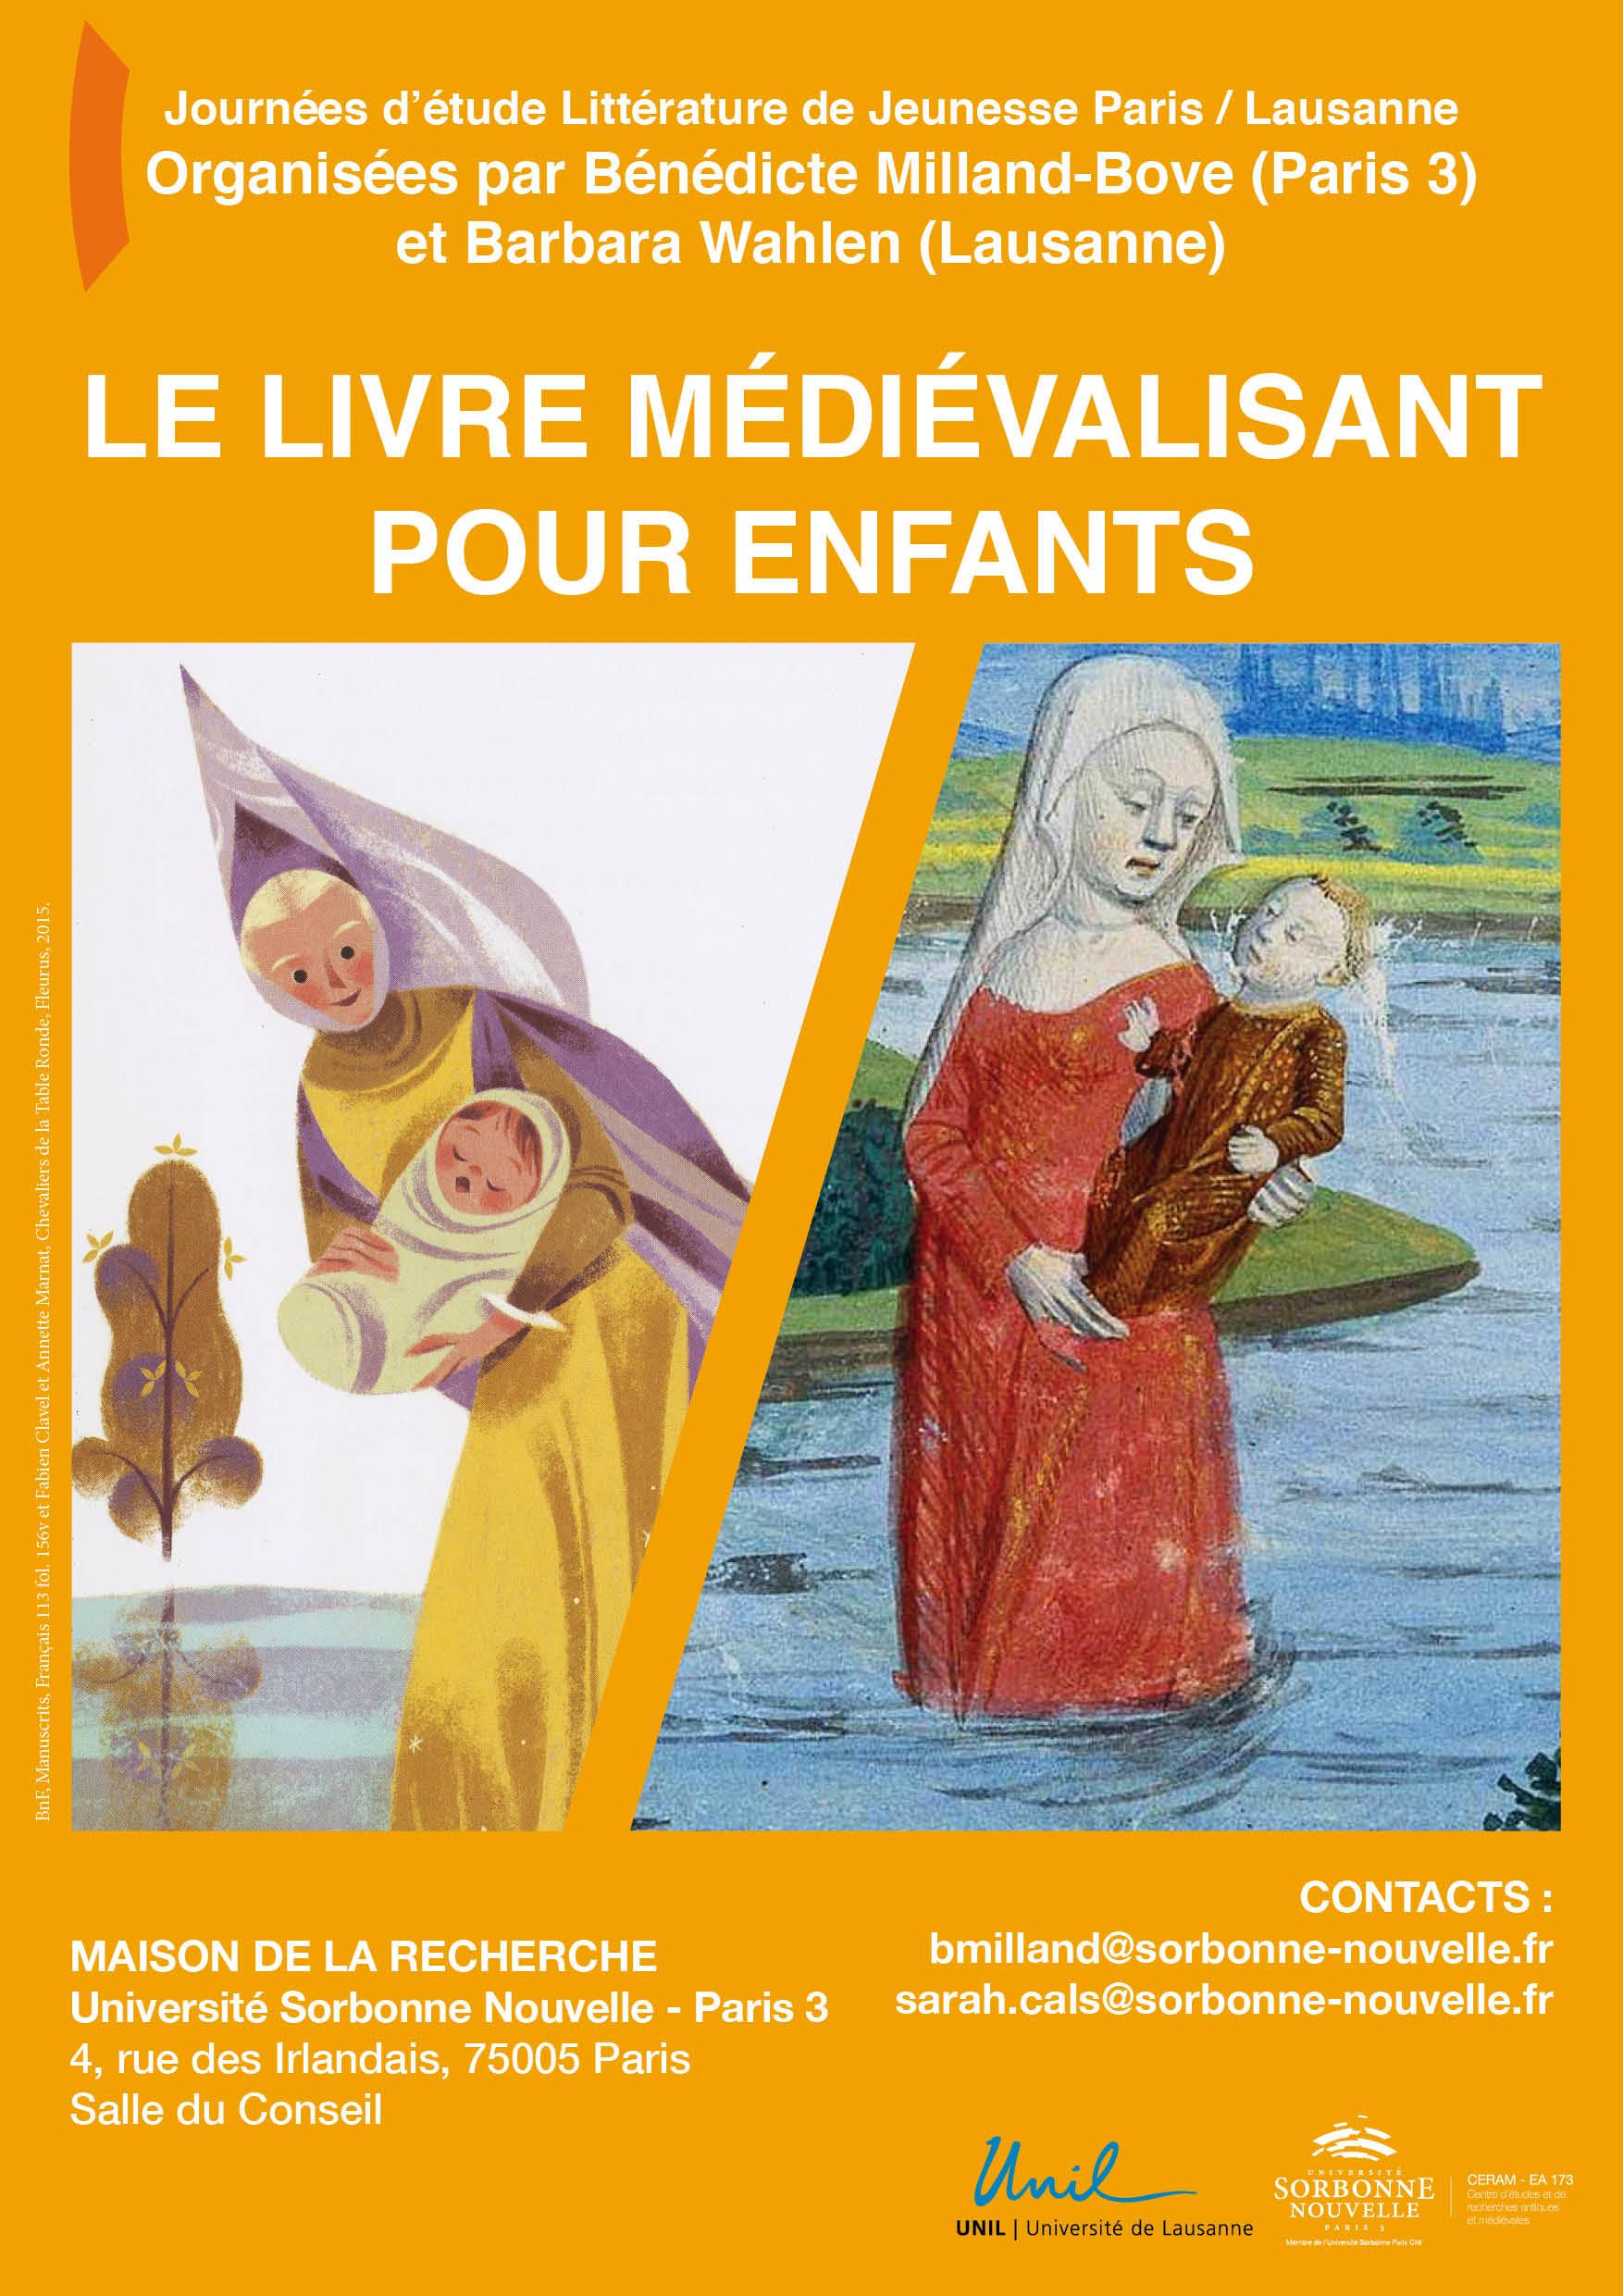 medievalisant affiche.jpg